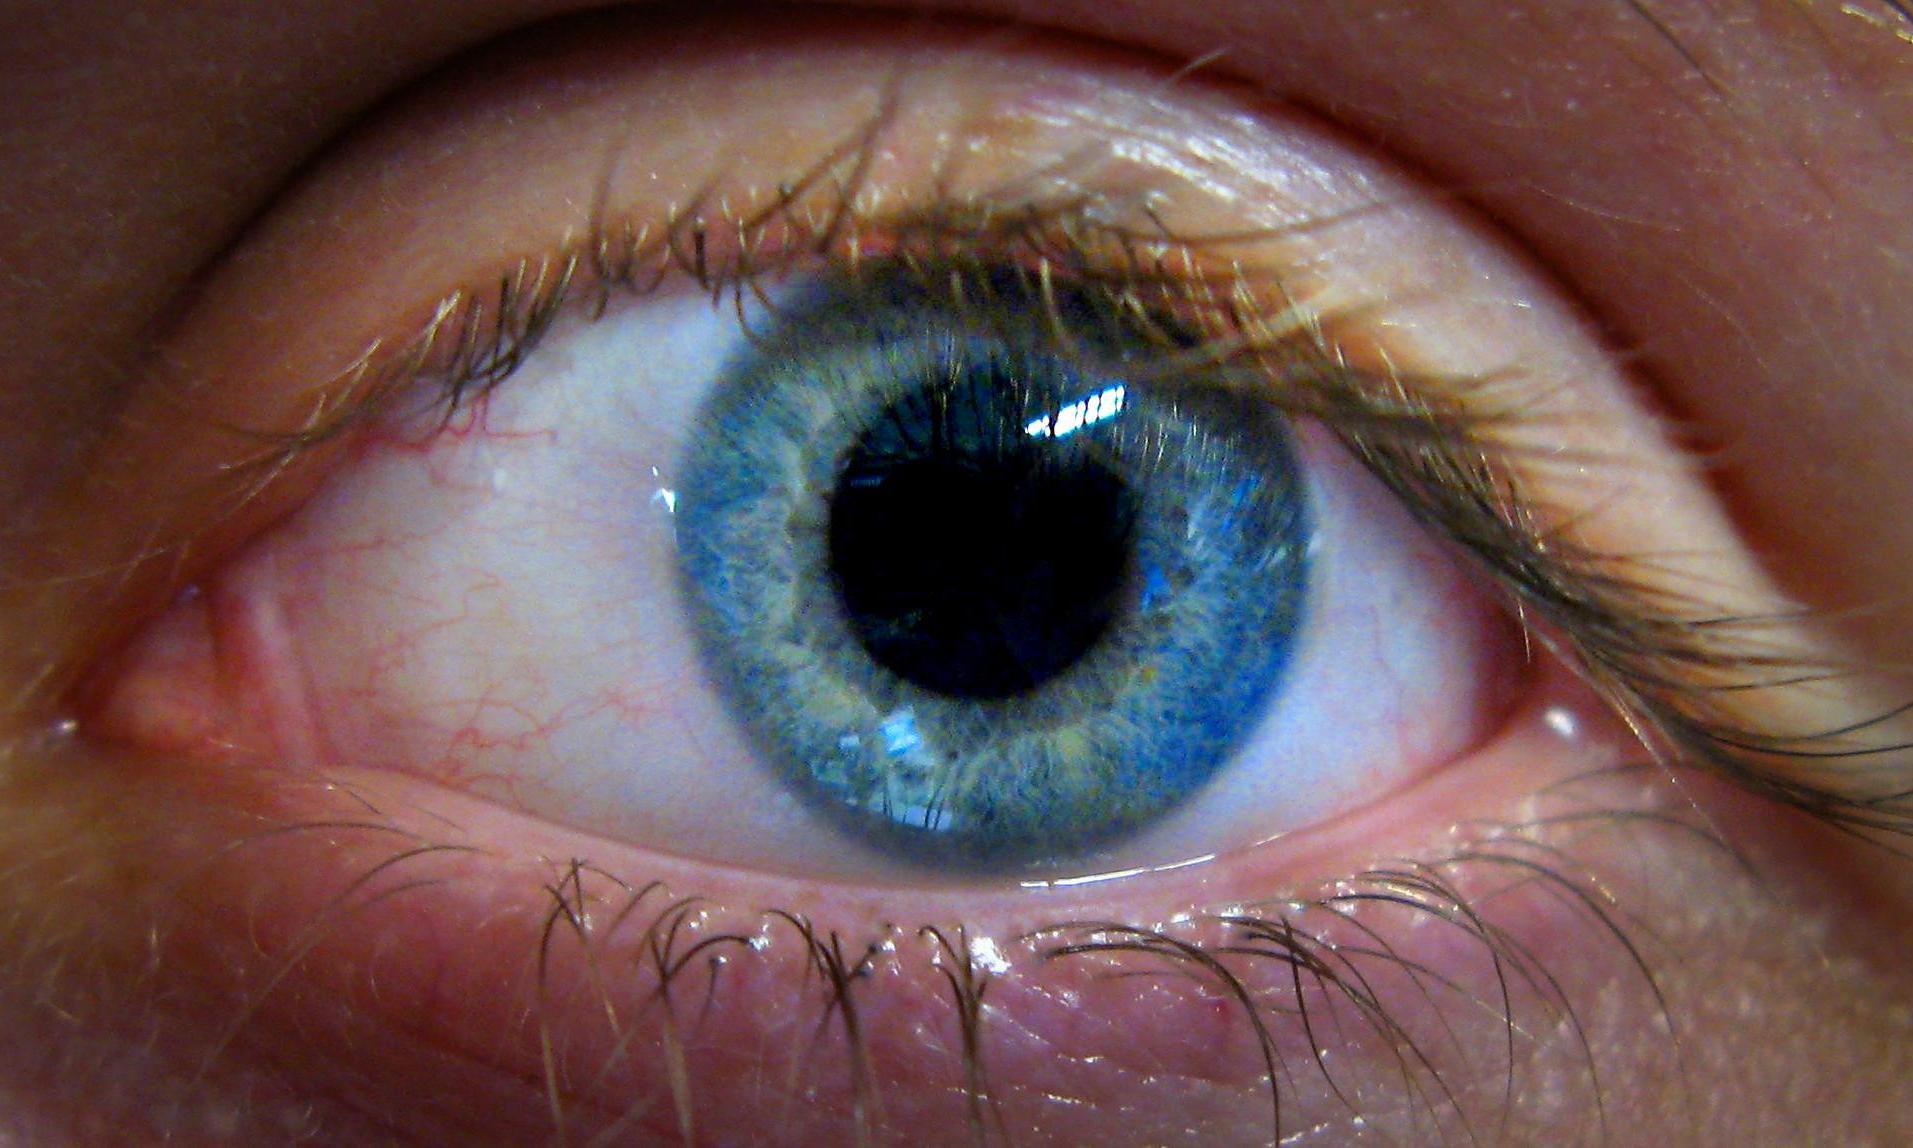 Recent Sight Treatments - Magazine cover